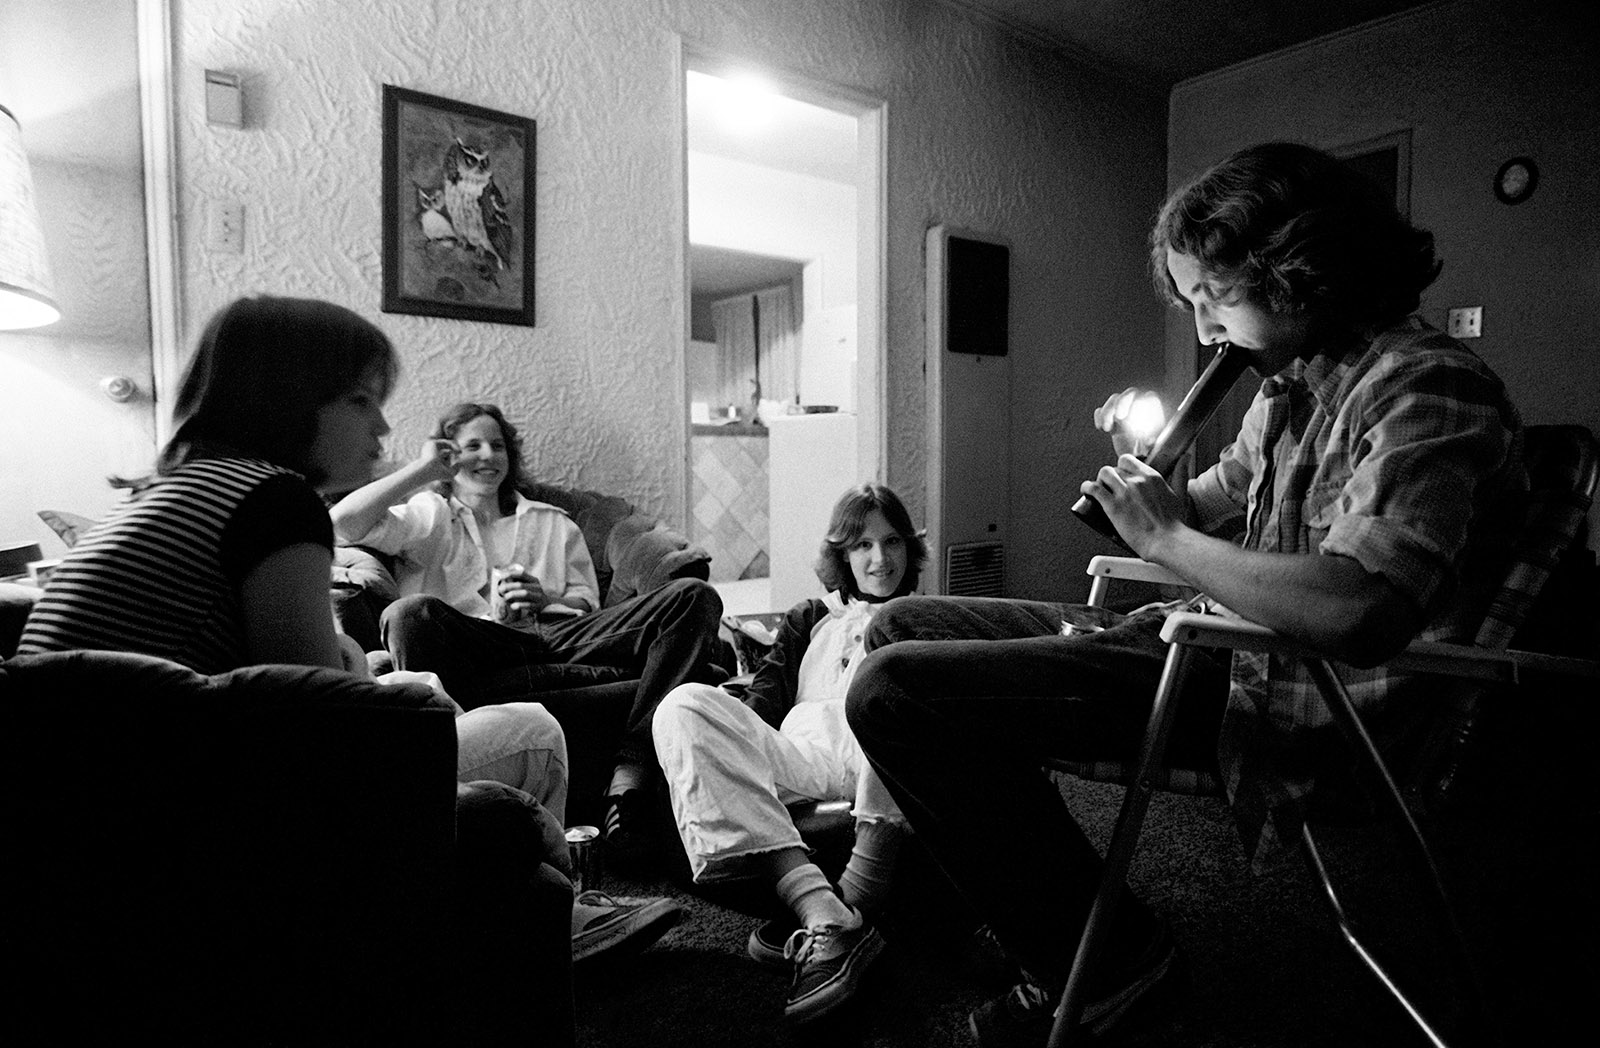 Teenagers smoking pot, Southern California, 1979